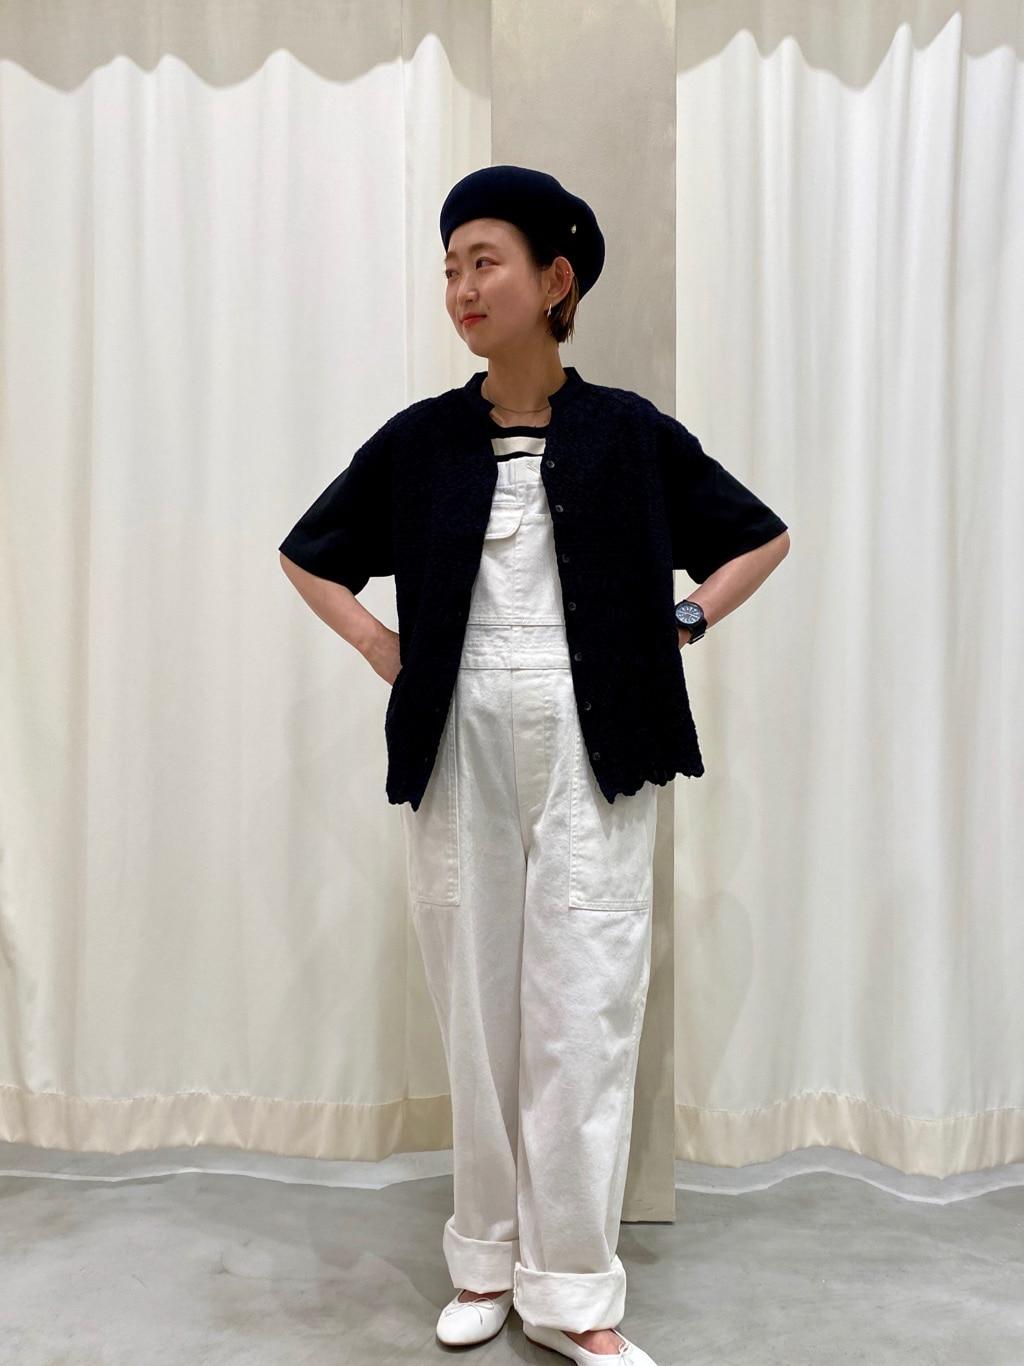 AMB SHOP CHILD WOMAN CHILD WOMAN , PAR ICI 東京スカイツリータウン・ソラマチ 身長:150cm 2020.07.08